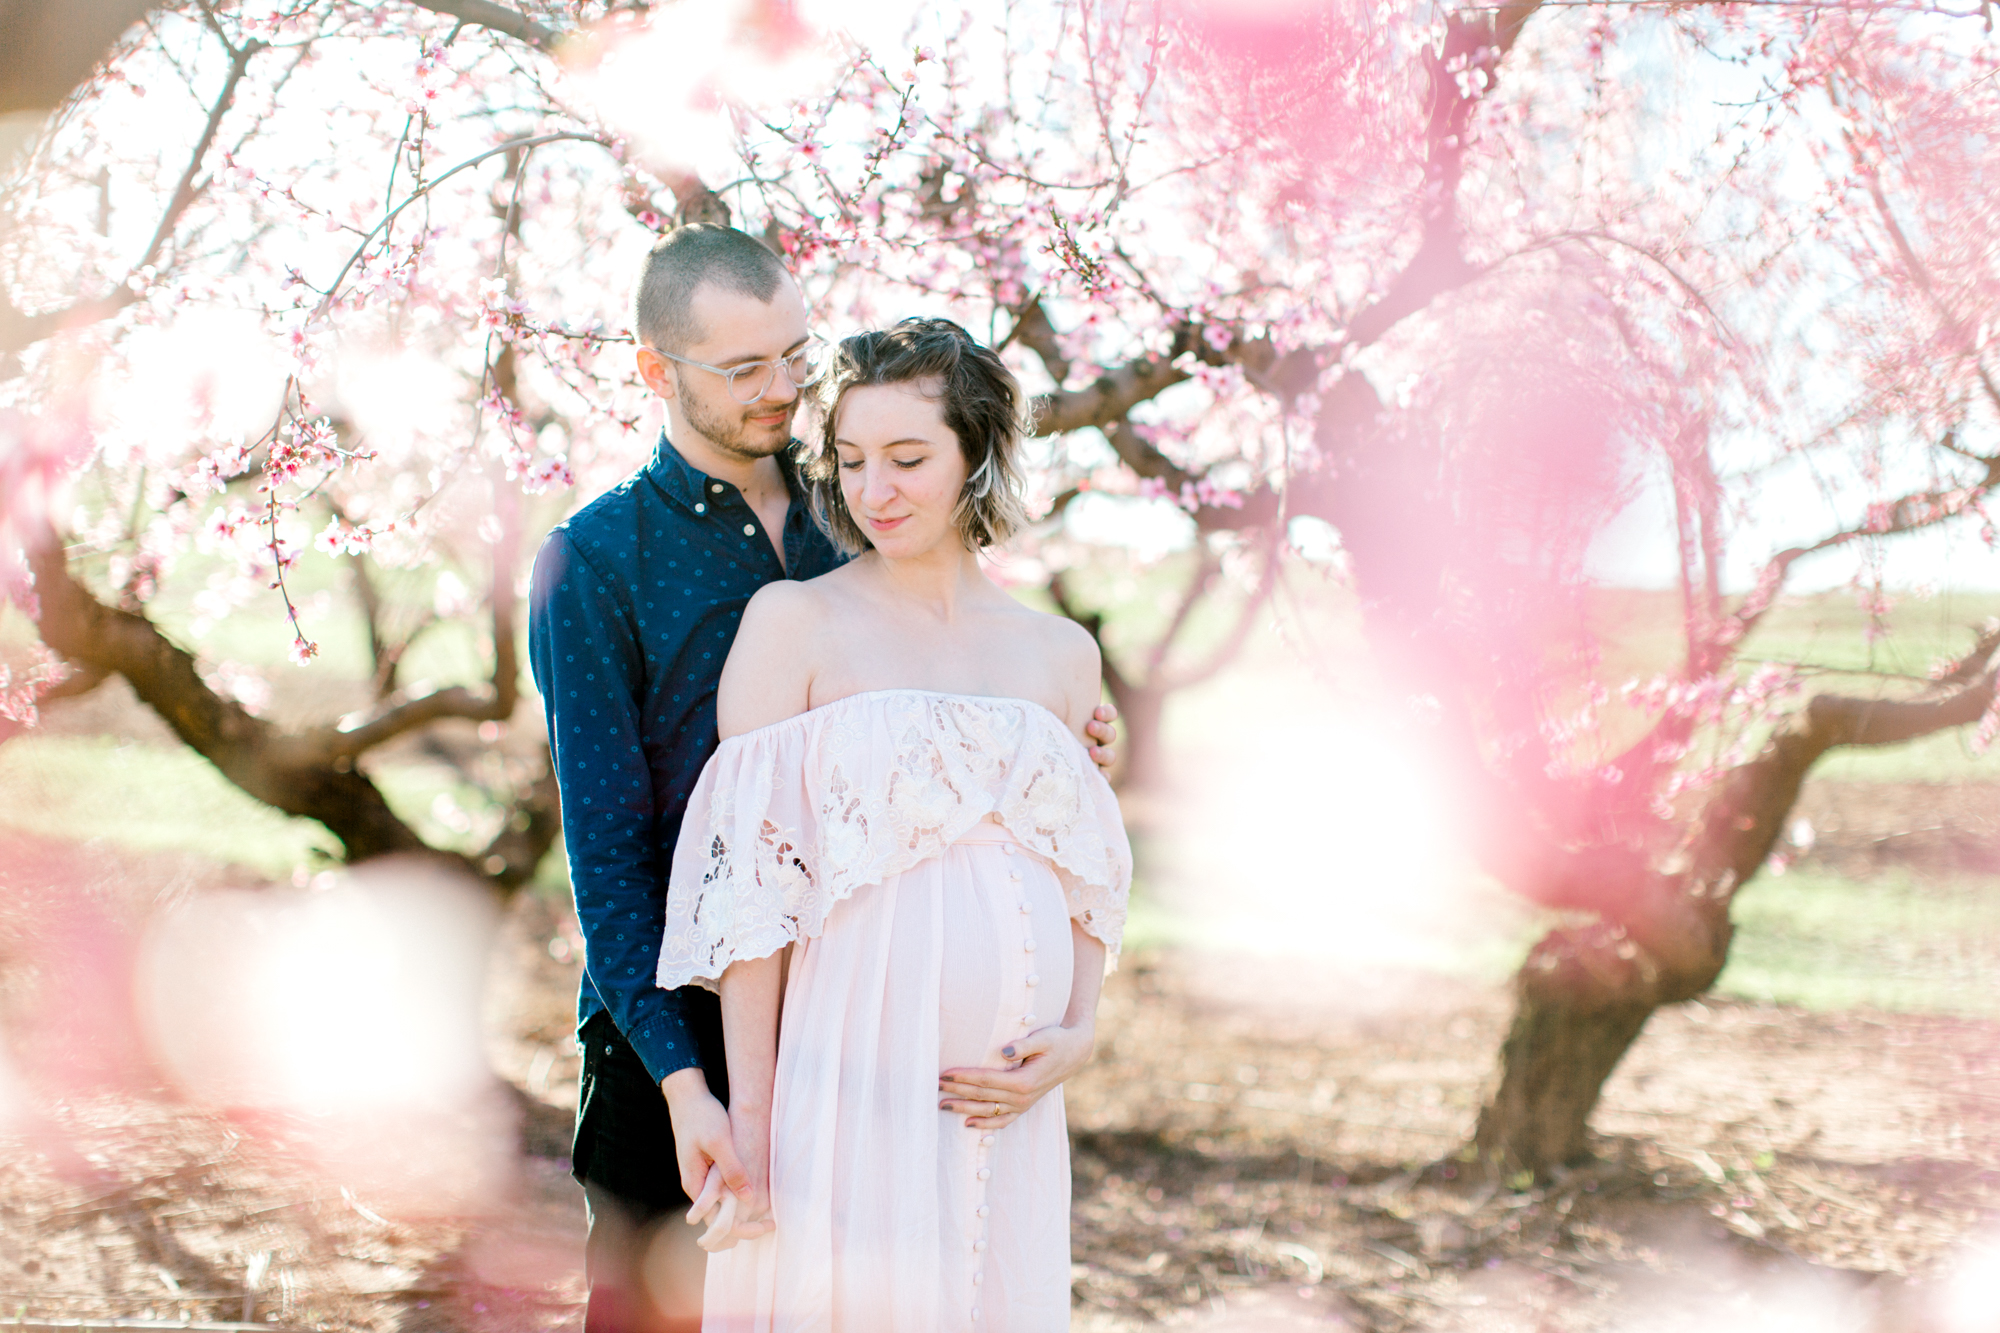 four corners photography peach blossom mini sessions peach blossom maternity session (3 of 25).jpg